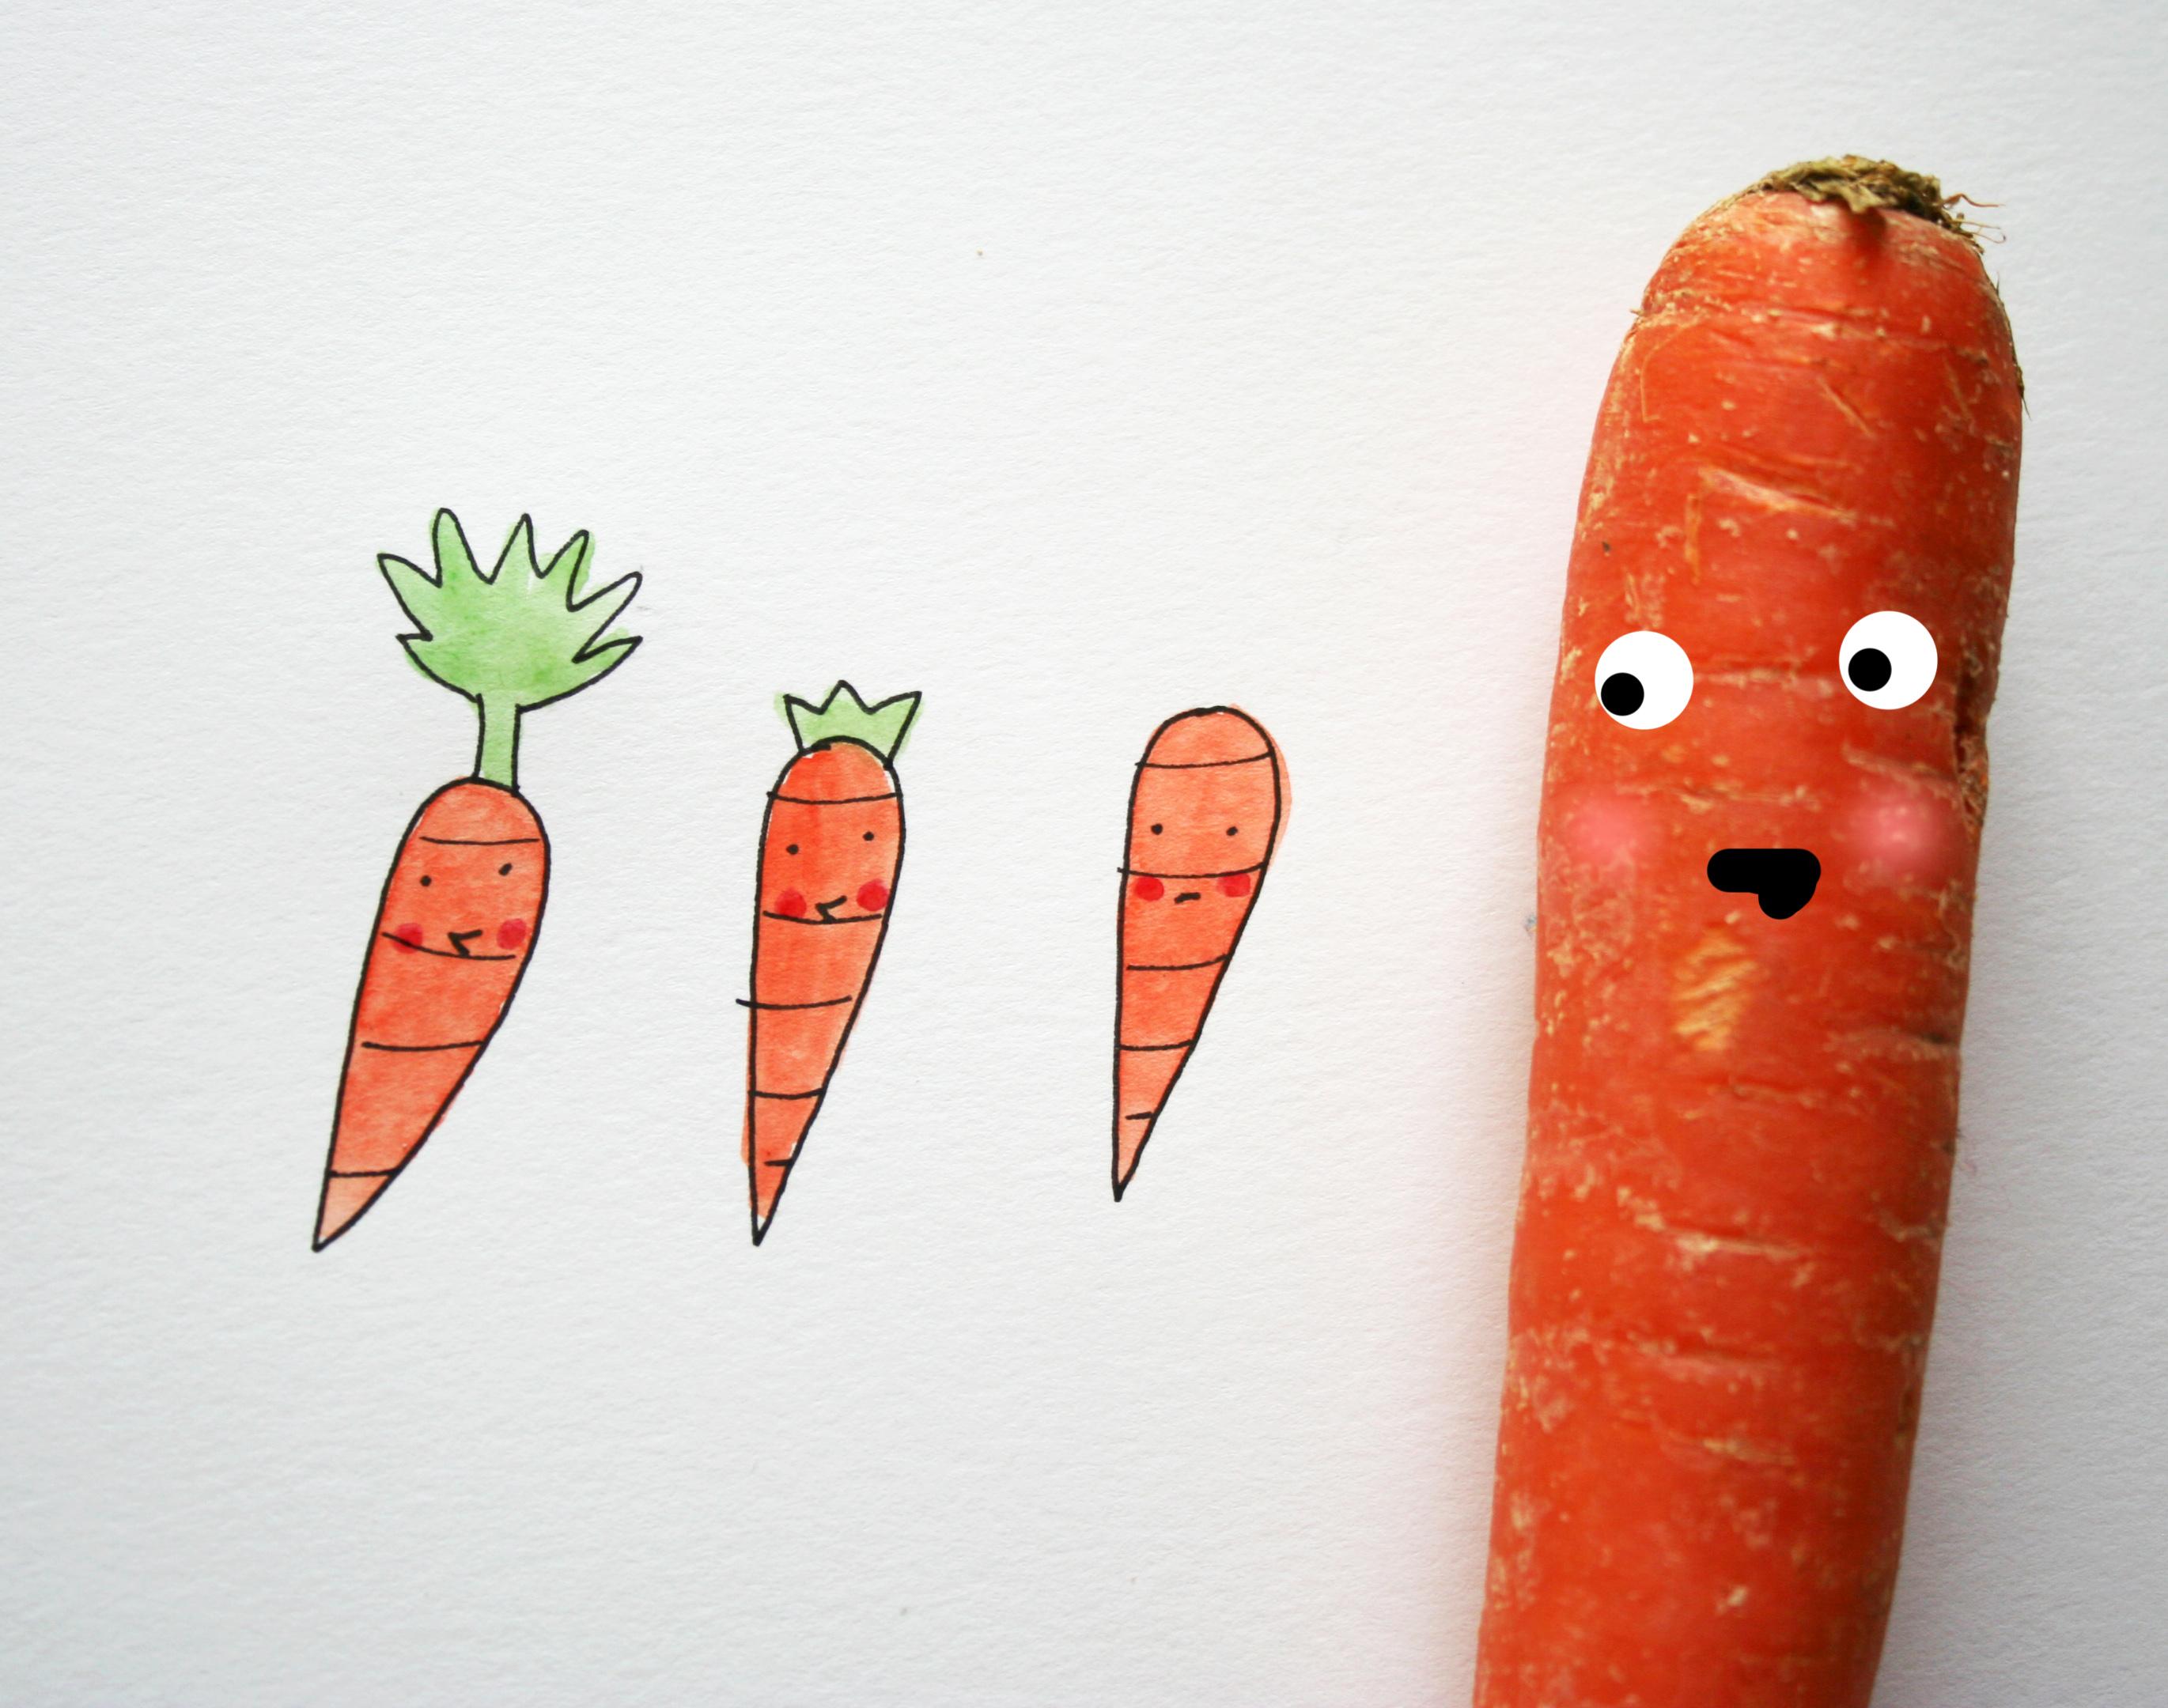 Drawn vegetable veggie Drawing How Draw Art Vegetables